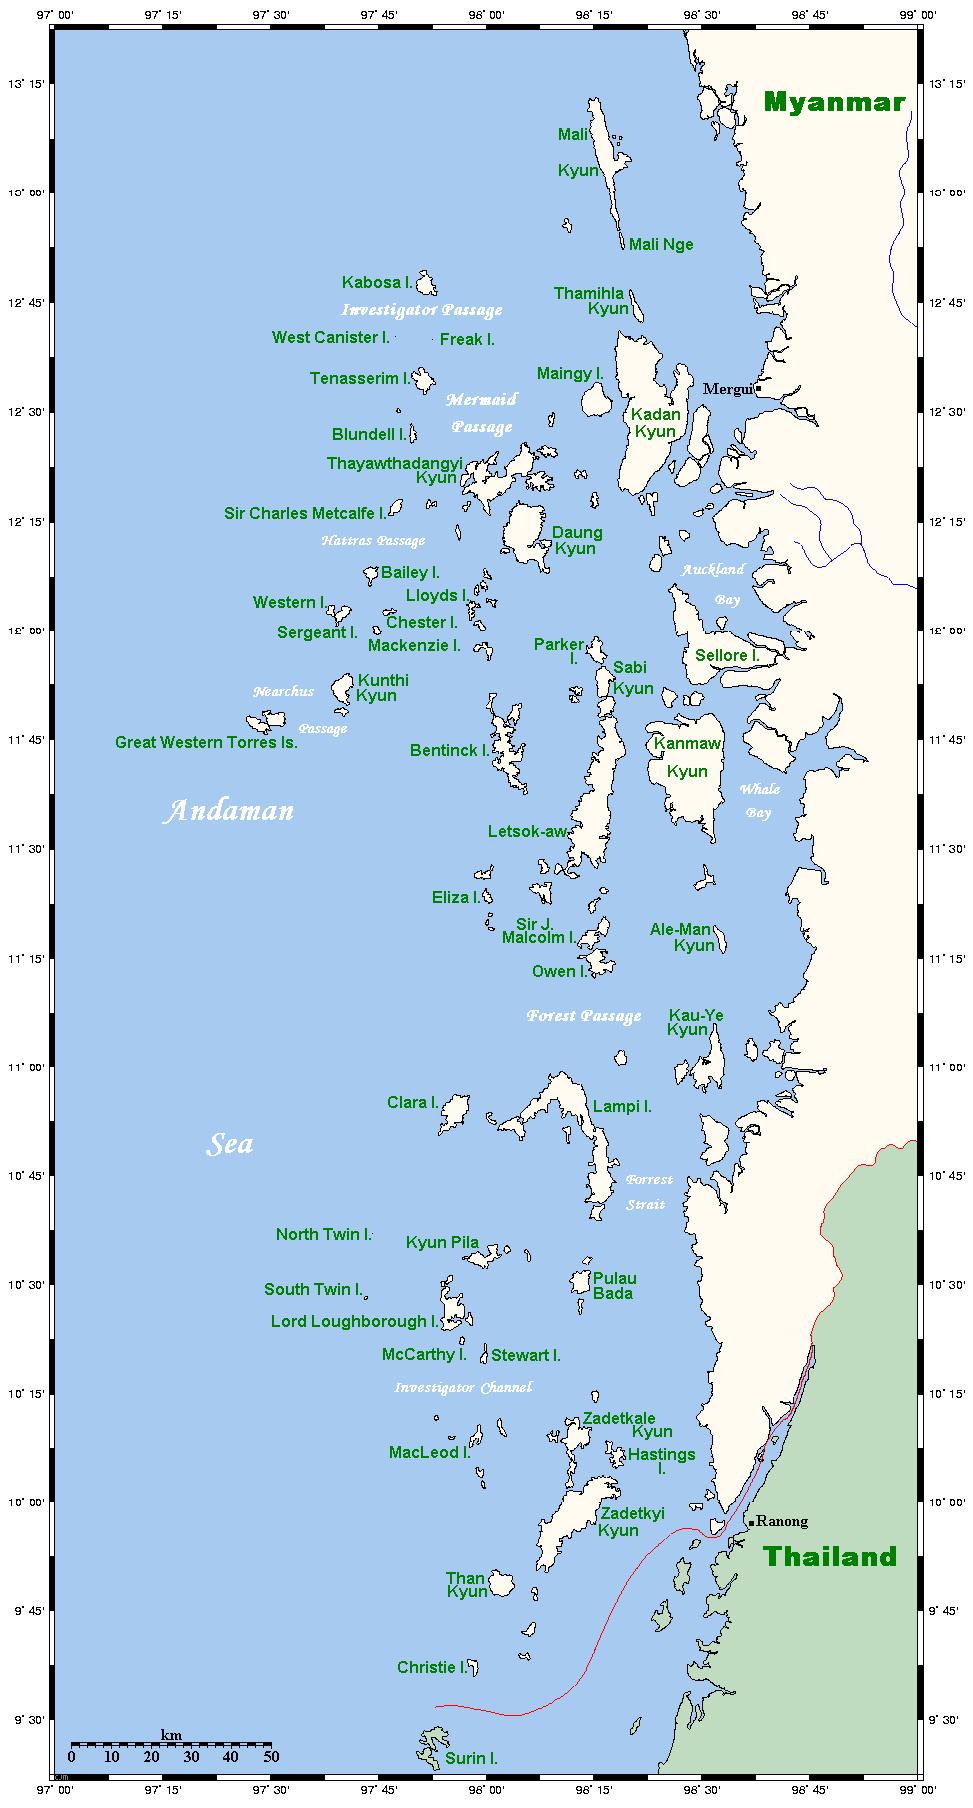 MerguiArchipelagoMap.png